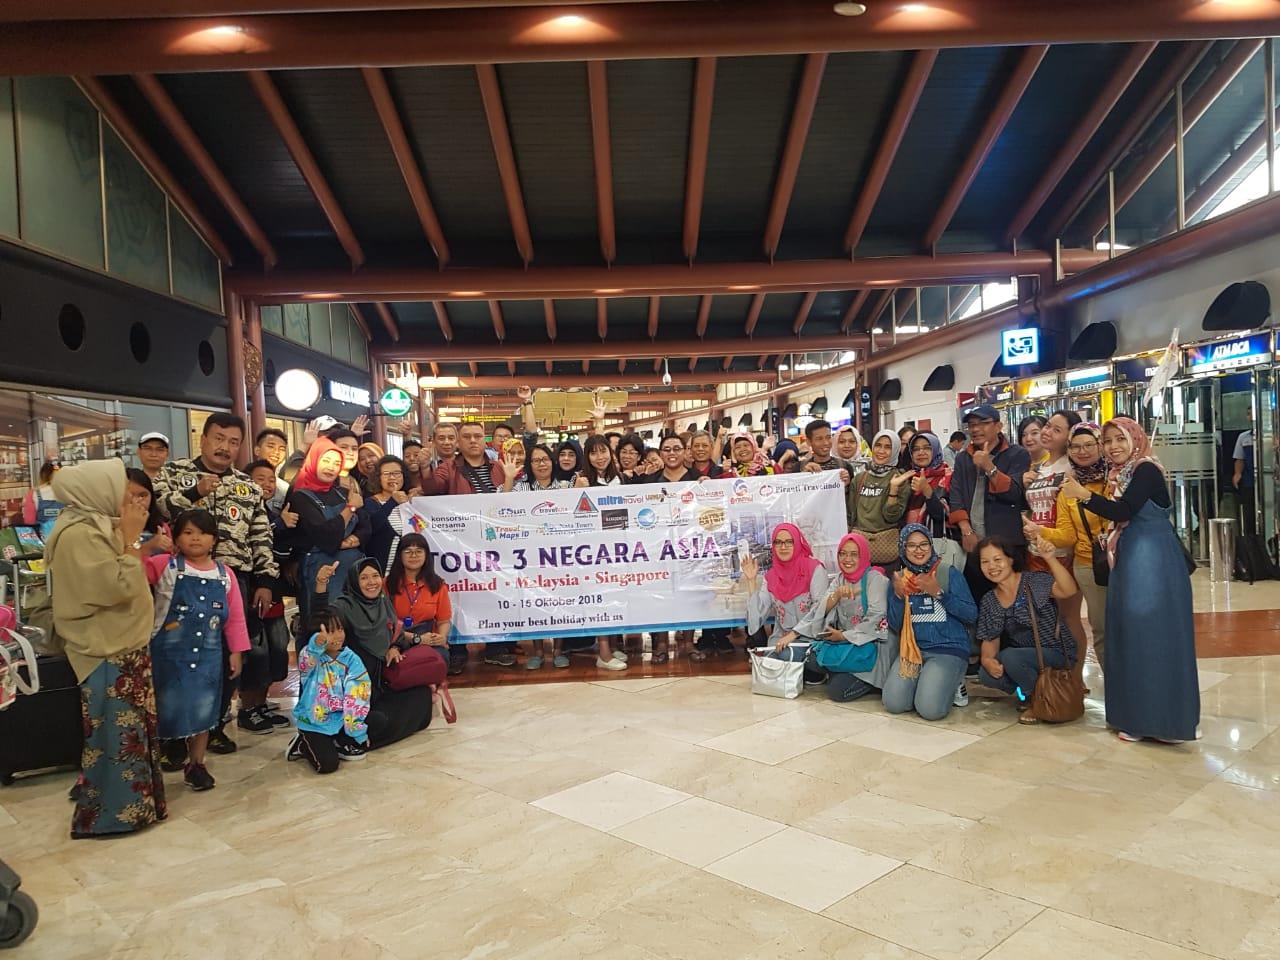 TOUR 3 NEGARA 10 - 15 OKT 2018